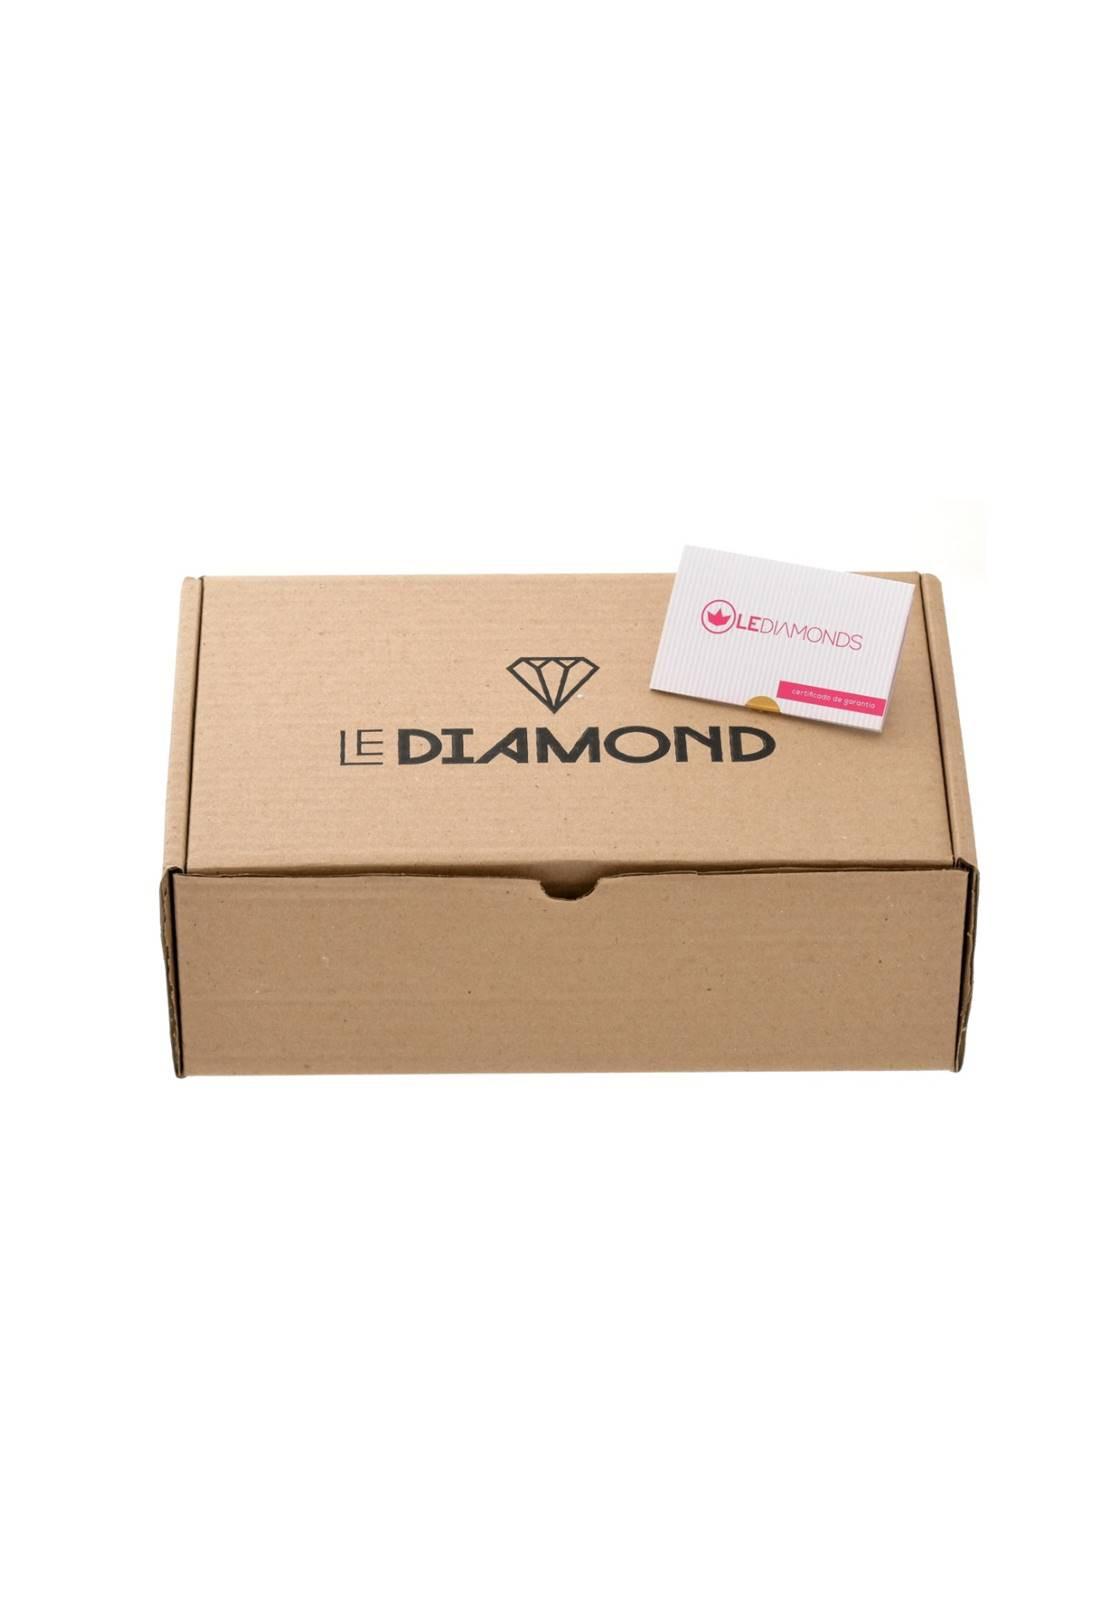 Brinco Le Diamond Chapa de Estamparia Vazada Dourado